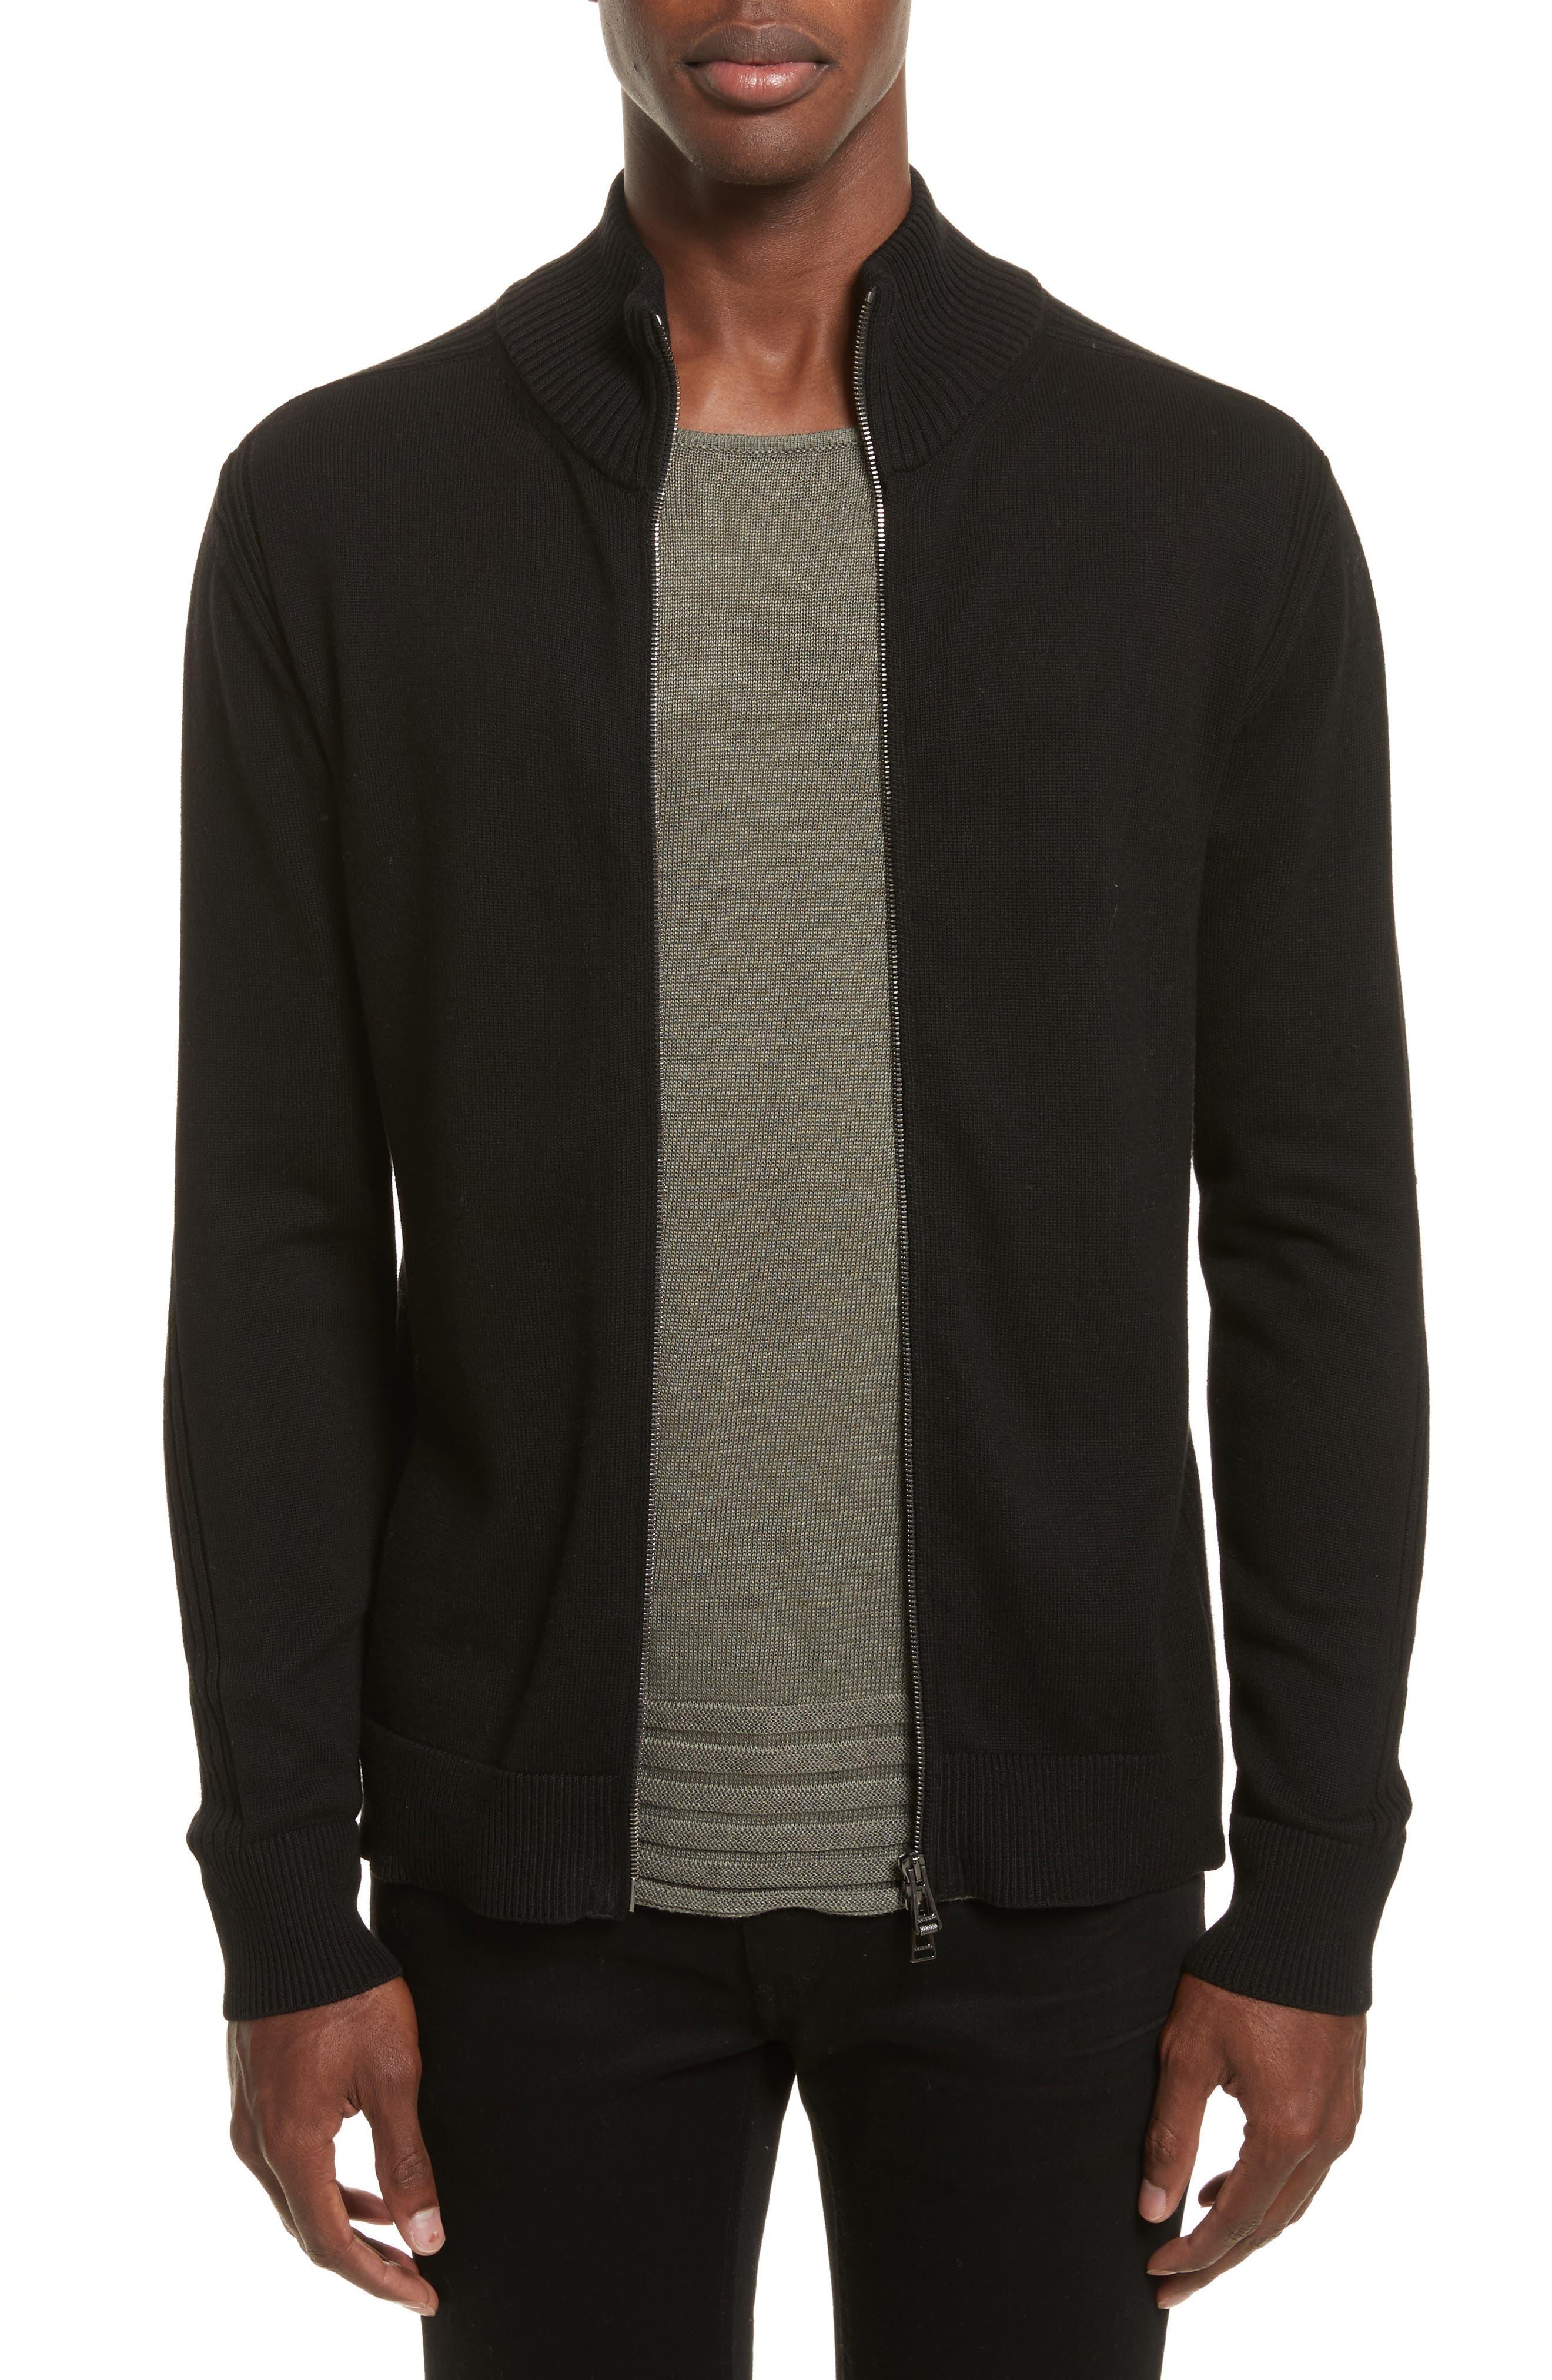 Allerford Knit Cotton Jacket,                         Main,                         color, Black